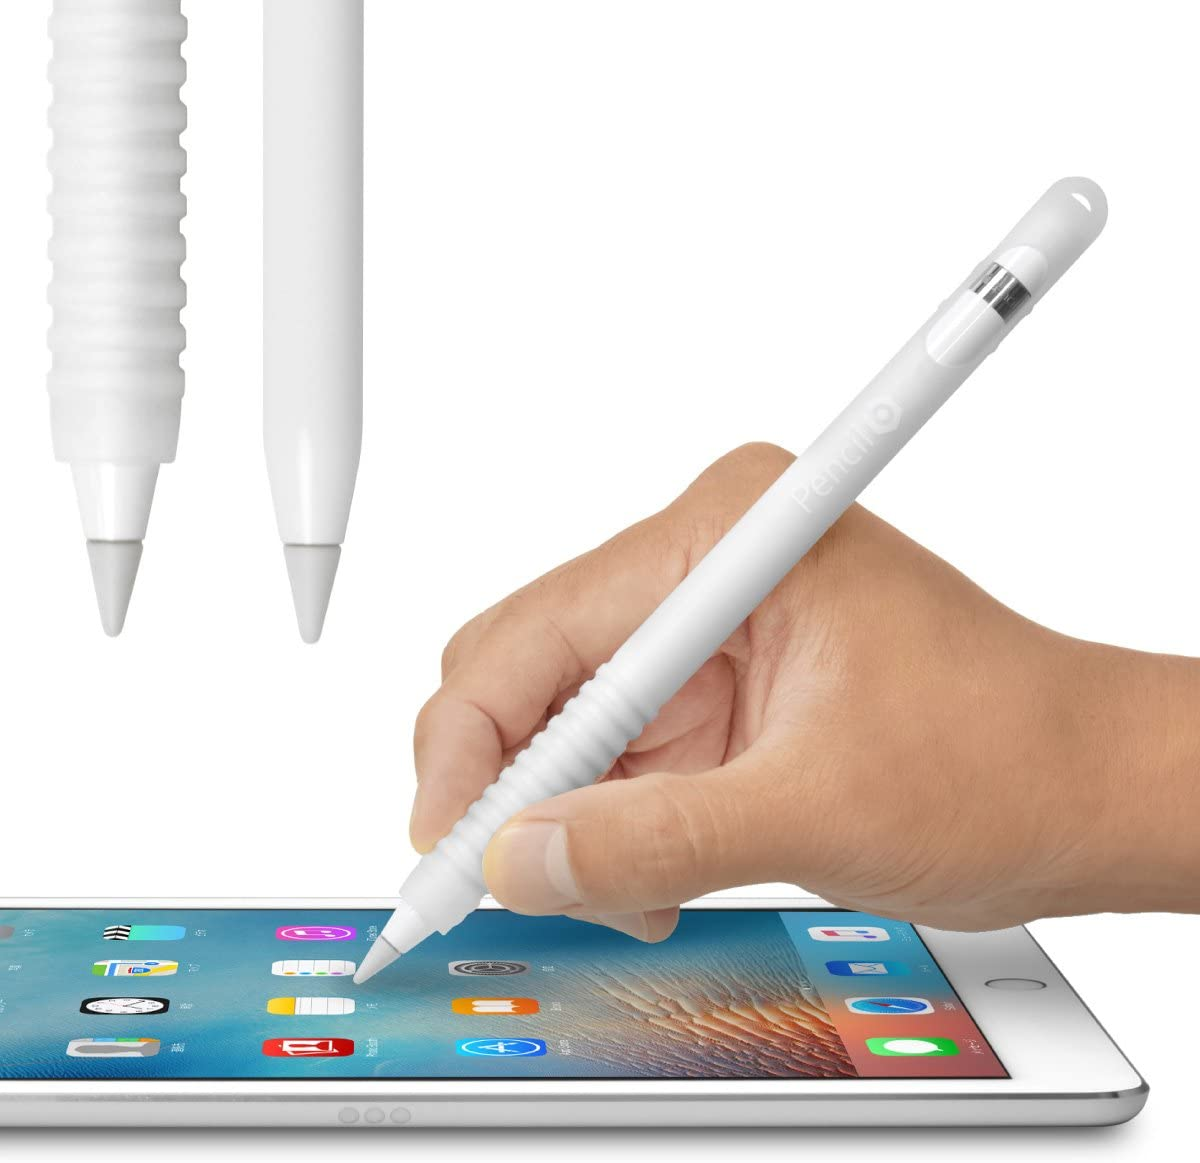 Pencil Barrier (クリアーホワイト) Apple Pencil を保護しグリップ力をアップする シリコン製カバー 充電時のキャップ紛失を防ぐ収納ヘッド搭載 ペンシルバリア アップルペンシル 用 JTT Online